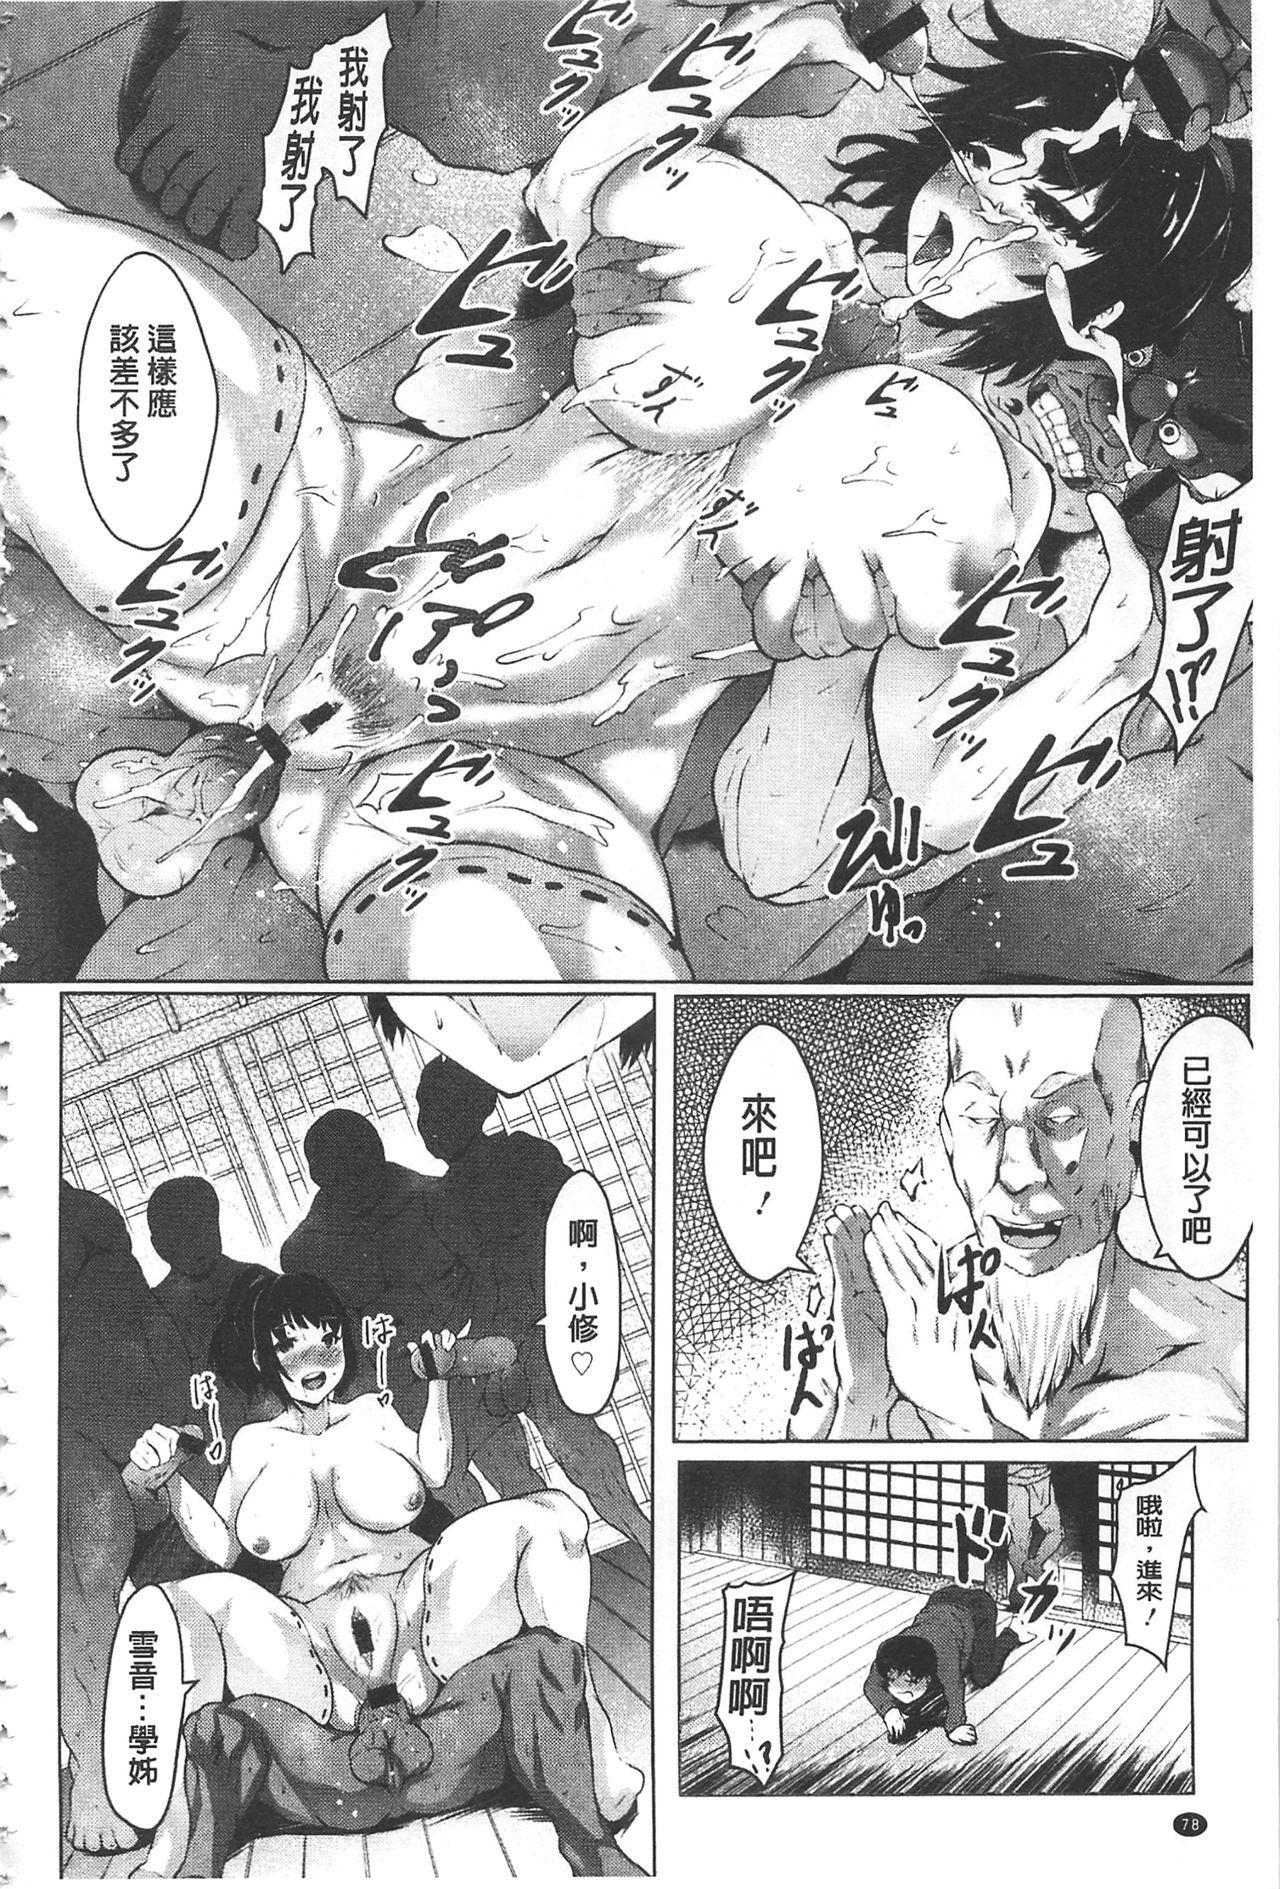 [Lorica] Biinkan Anal ~Kakusei Nejikomi Ana~ | 美淫感猥菊花 塞入擴張覺醒穴 [Chinese] 78